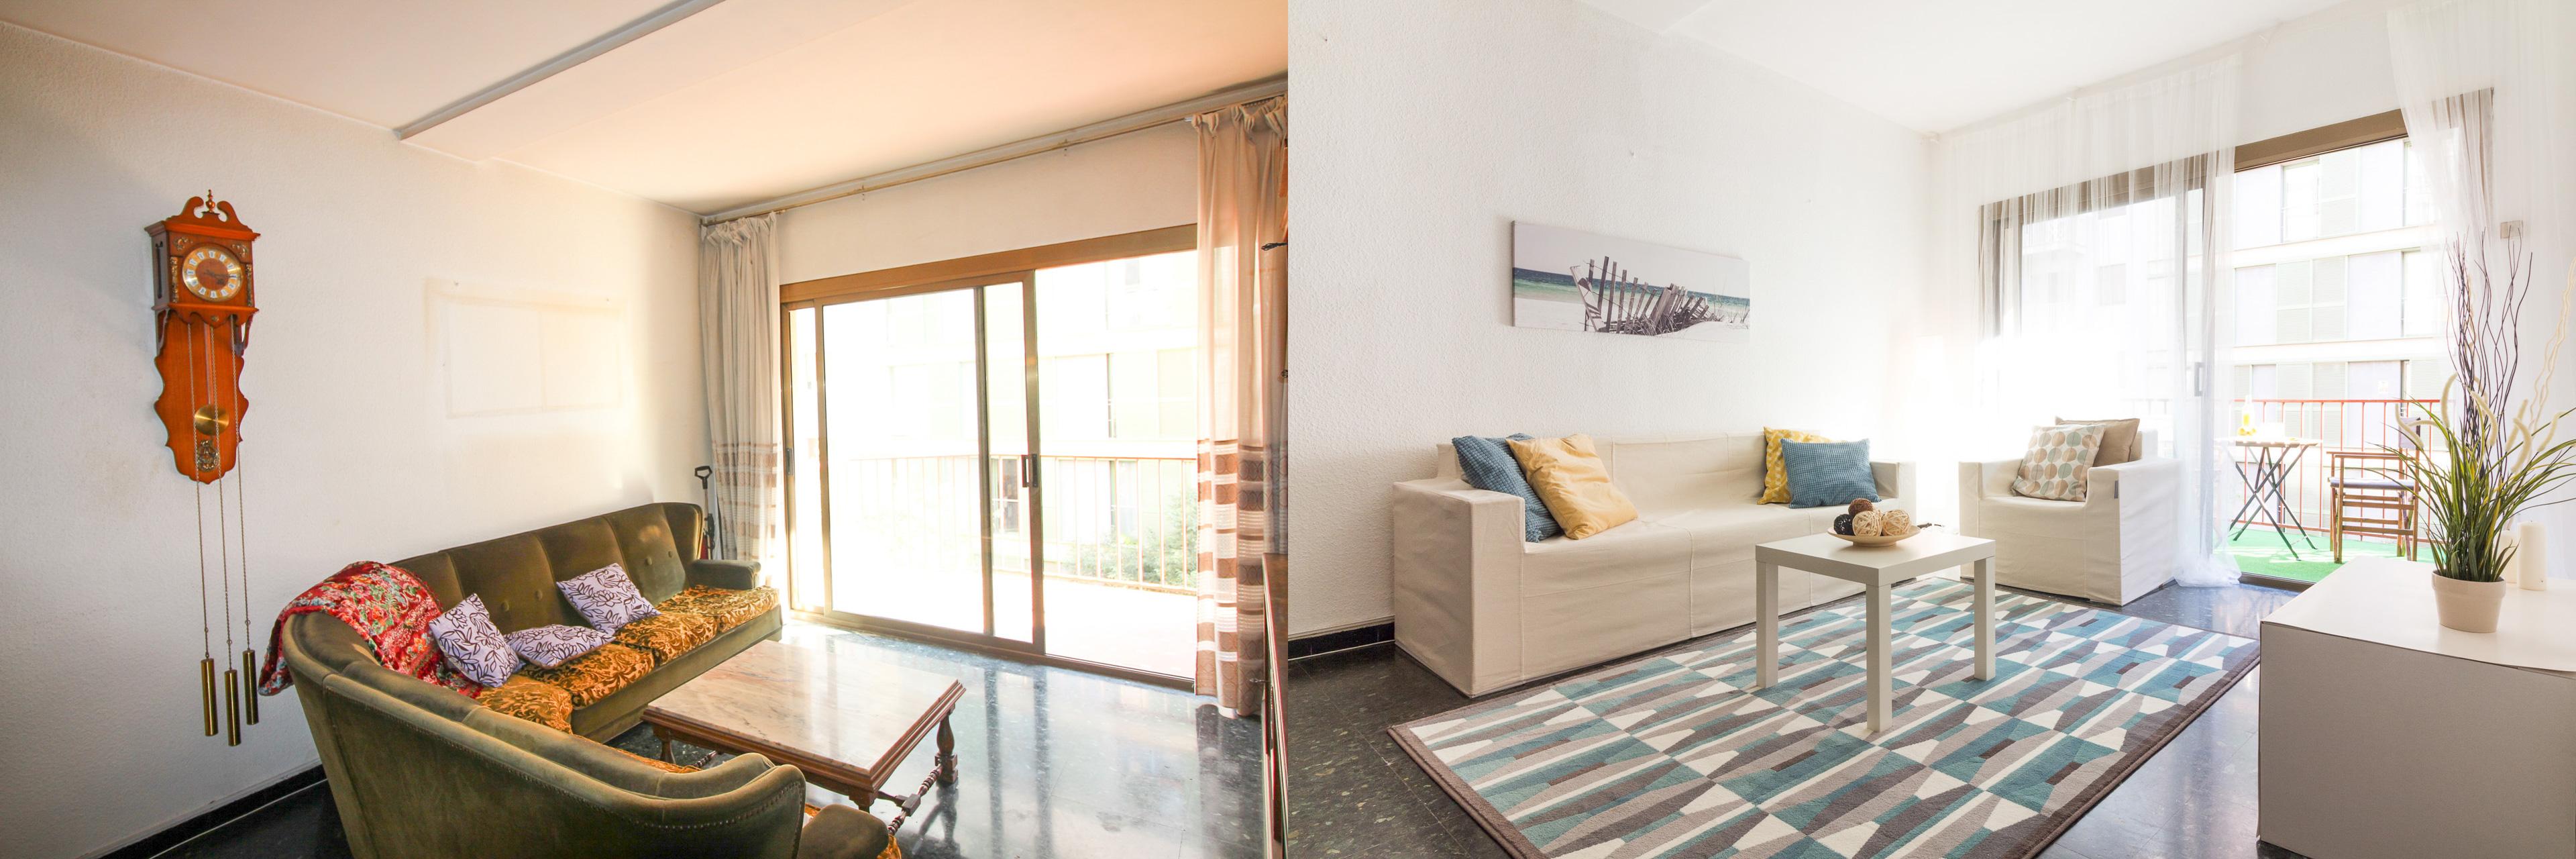 Home staging barcelona salón